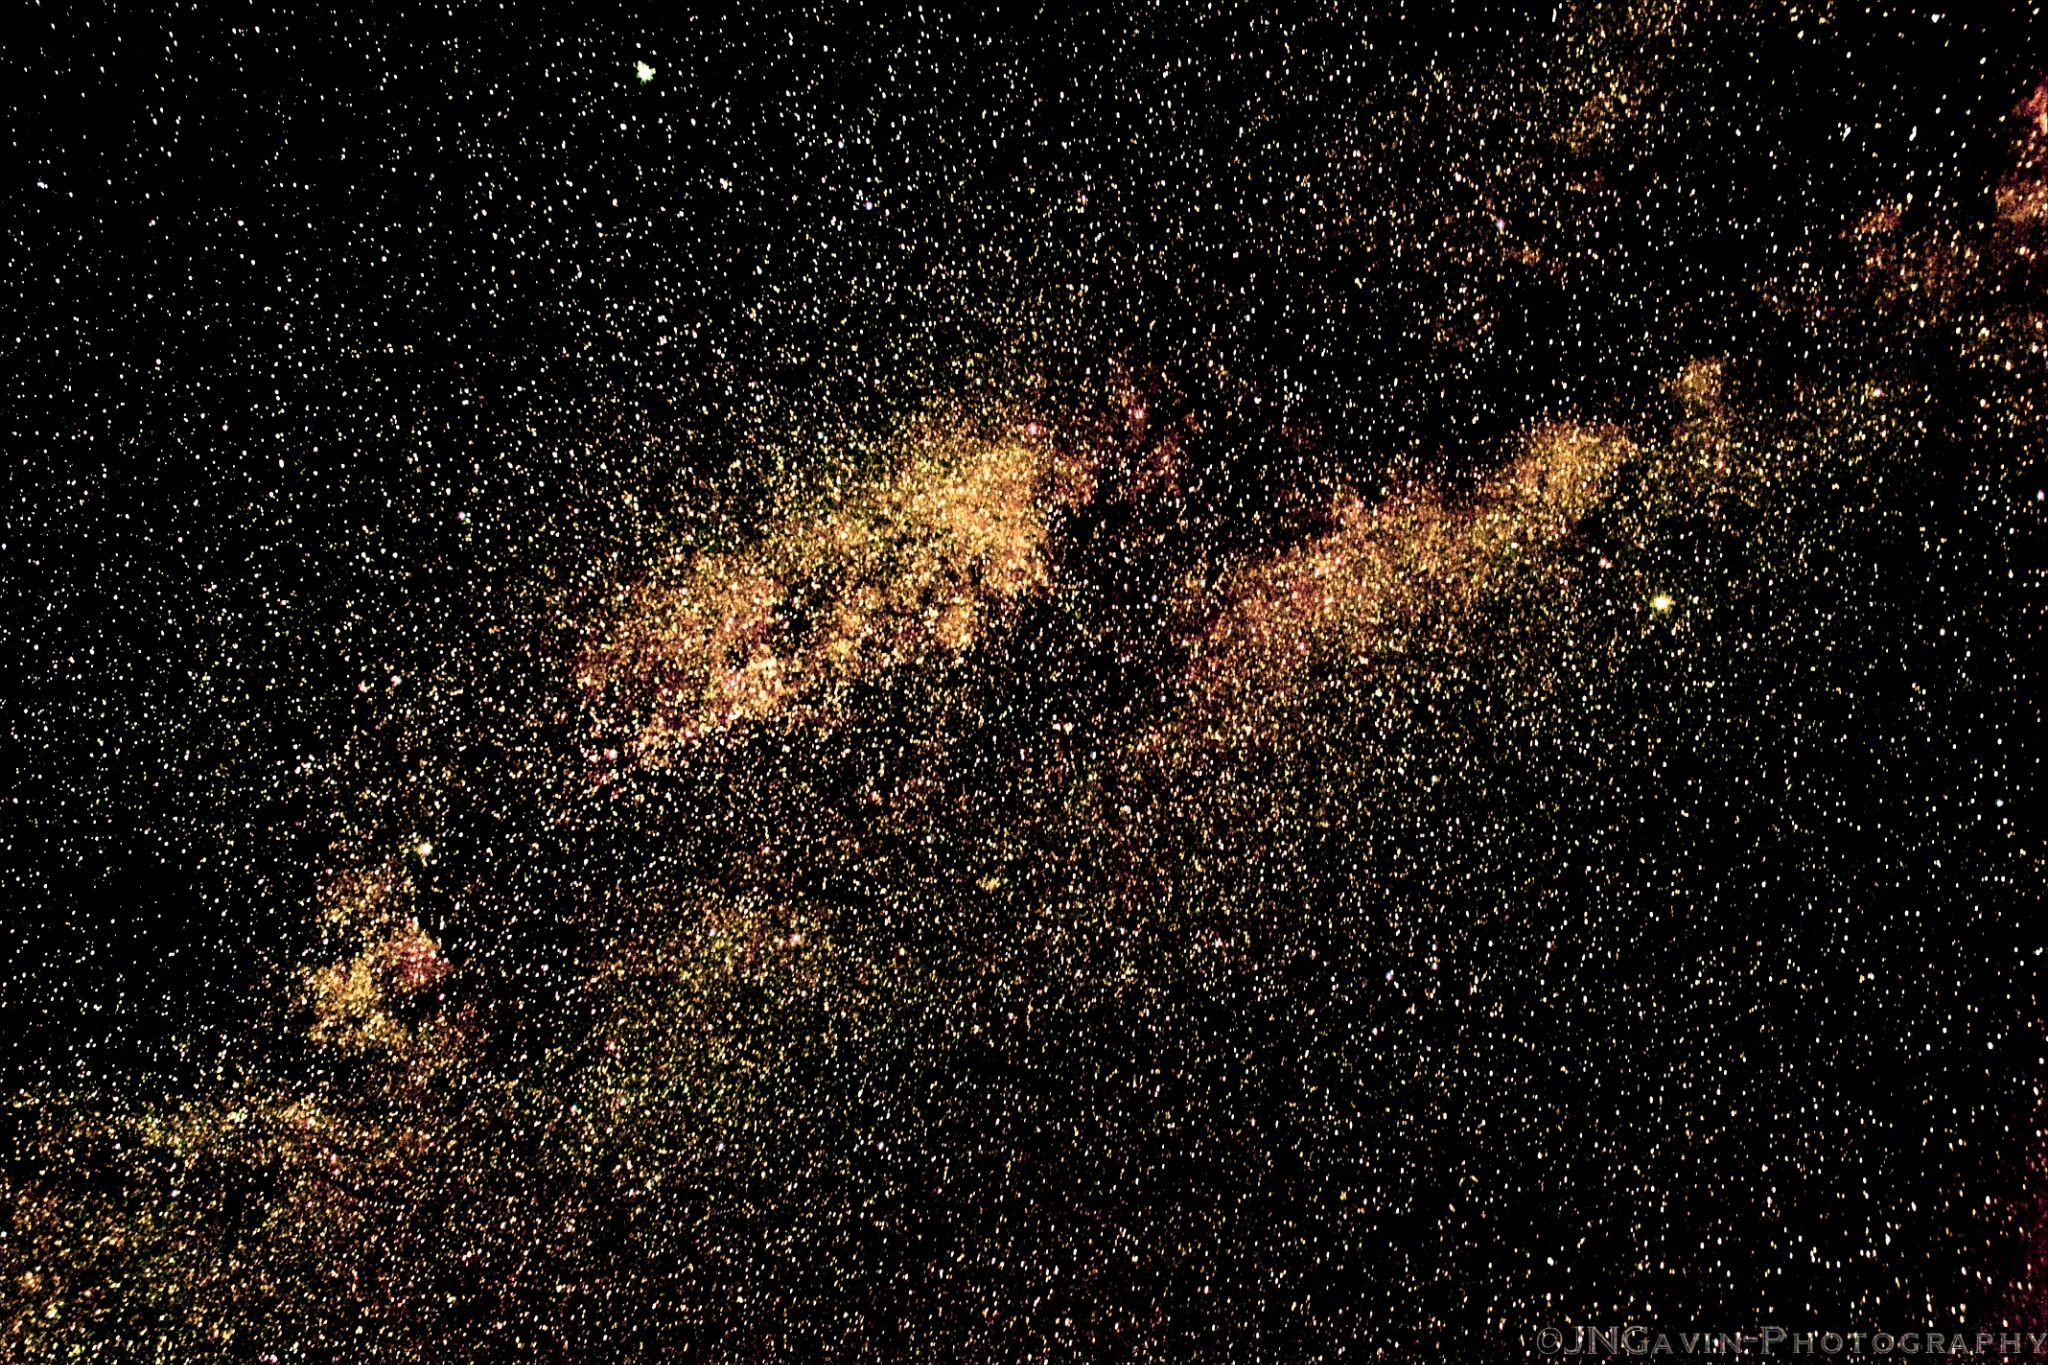 Milky Way by John Gavin